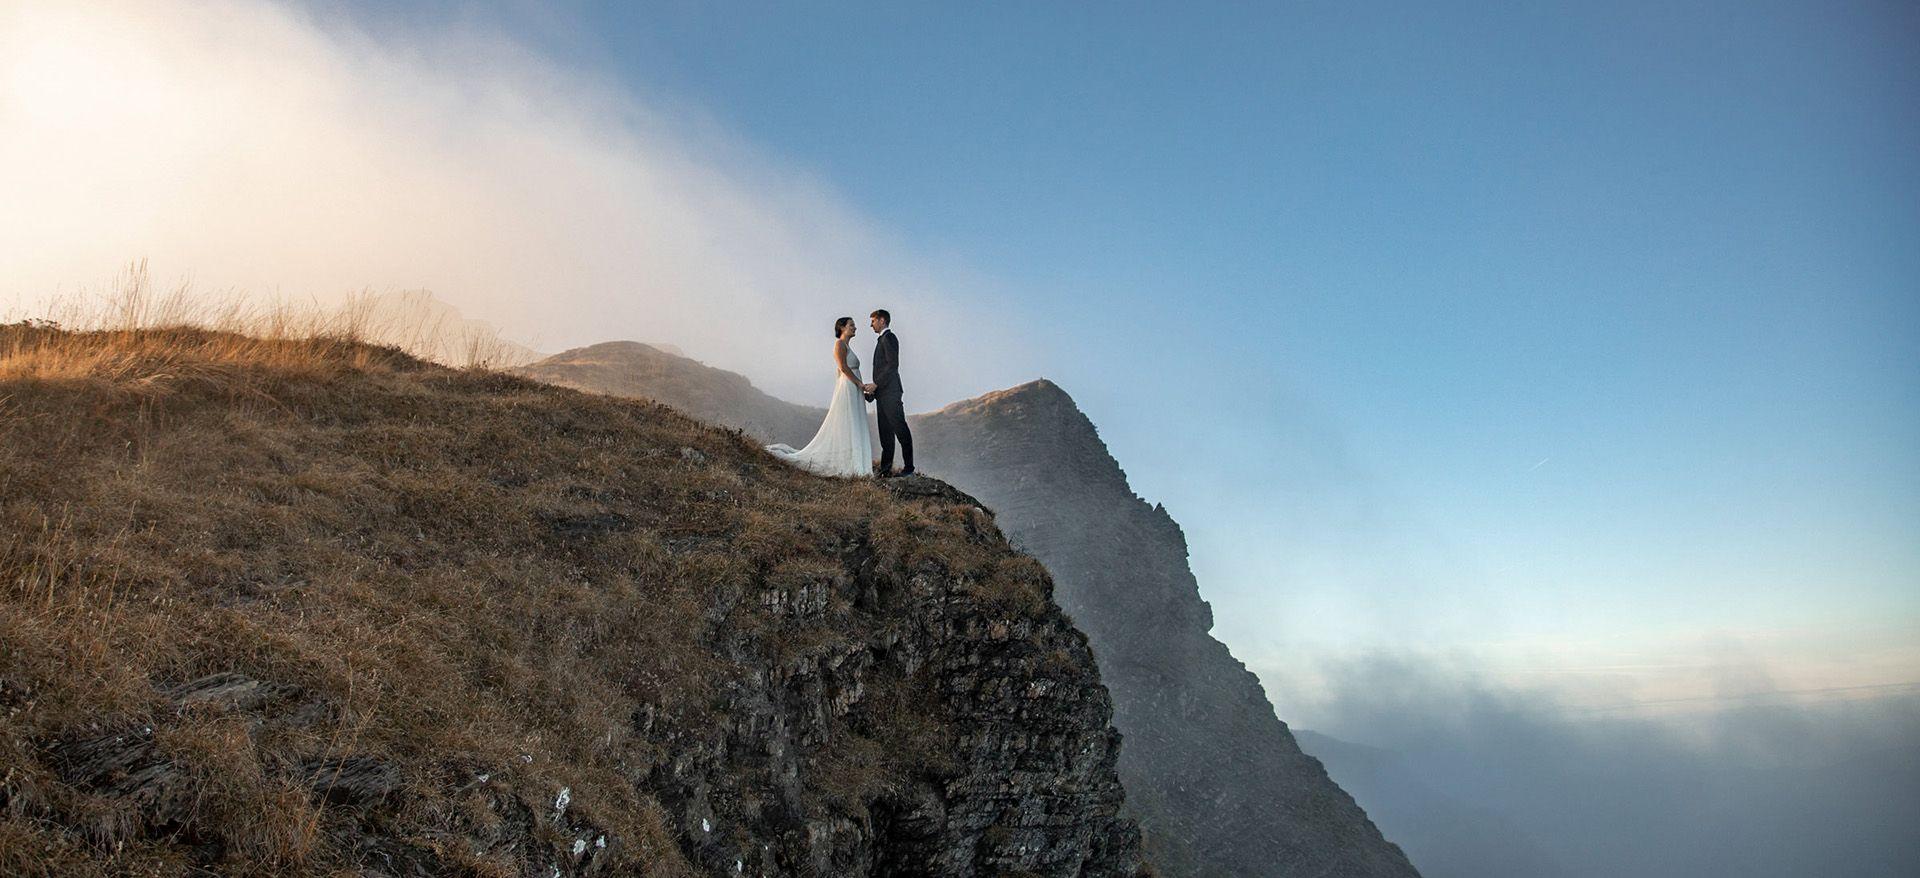 austria hiking adventure wedding package